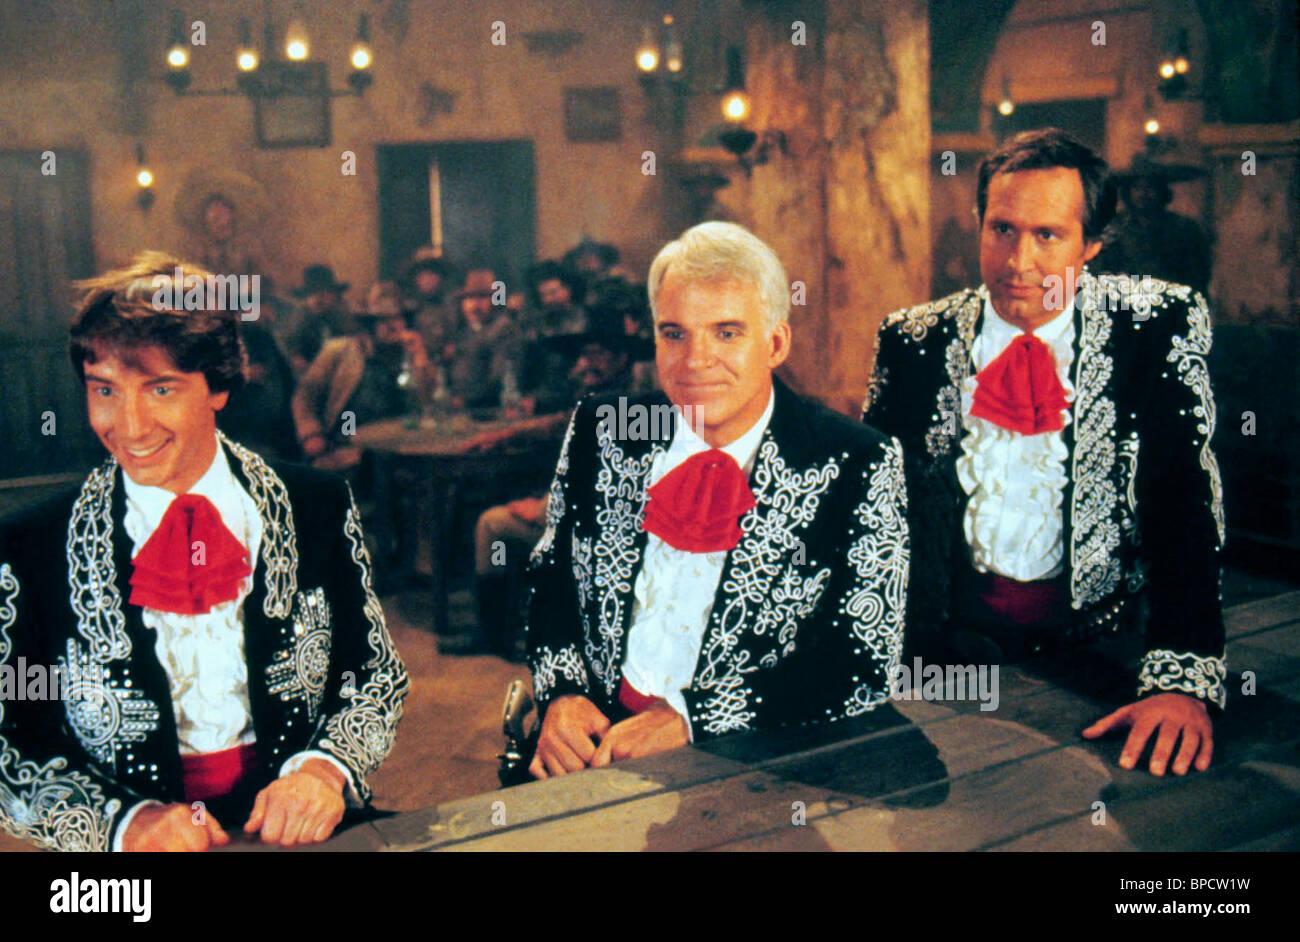 Image result for steve martin three amigos